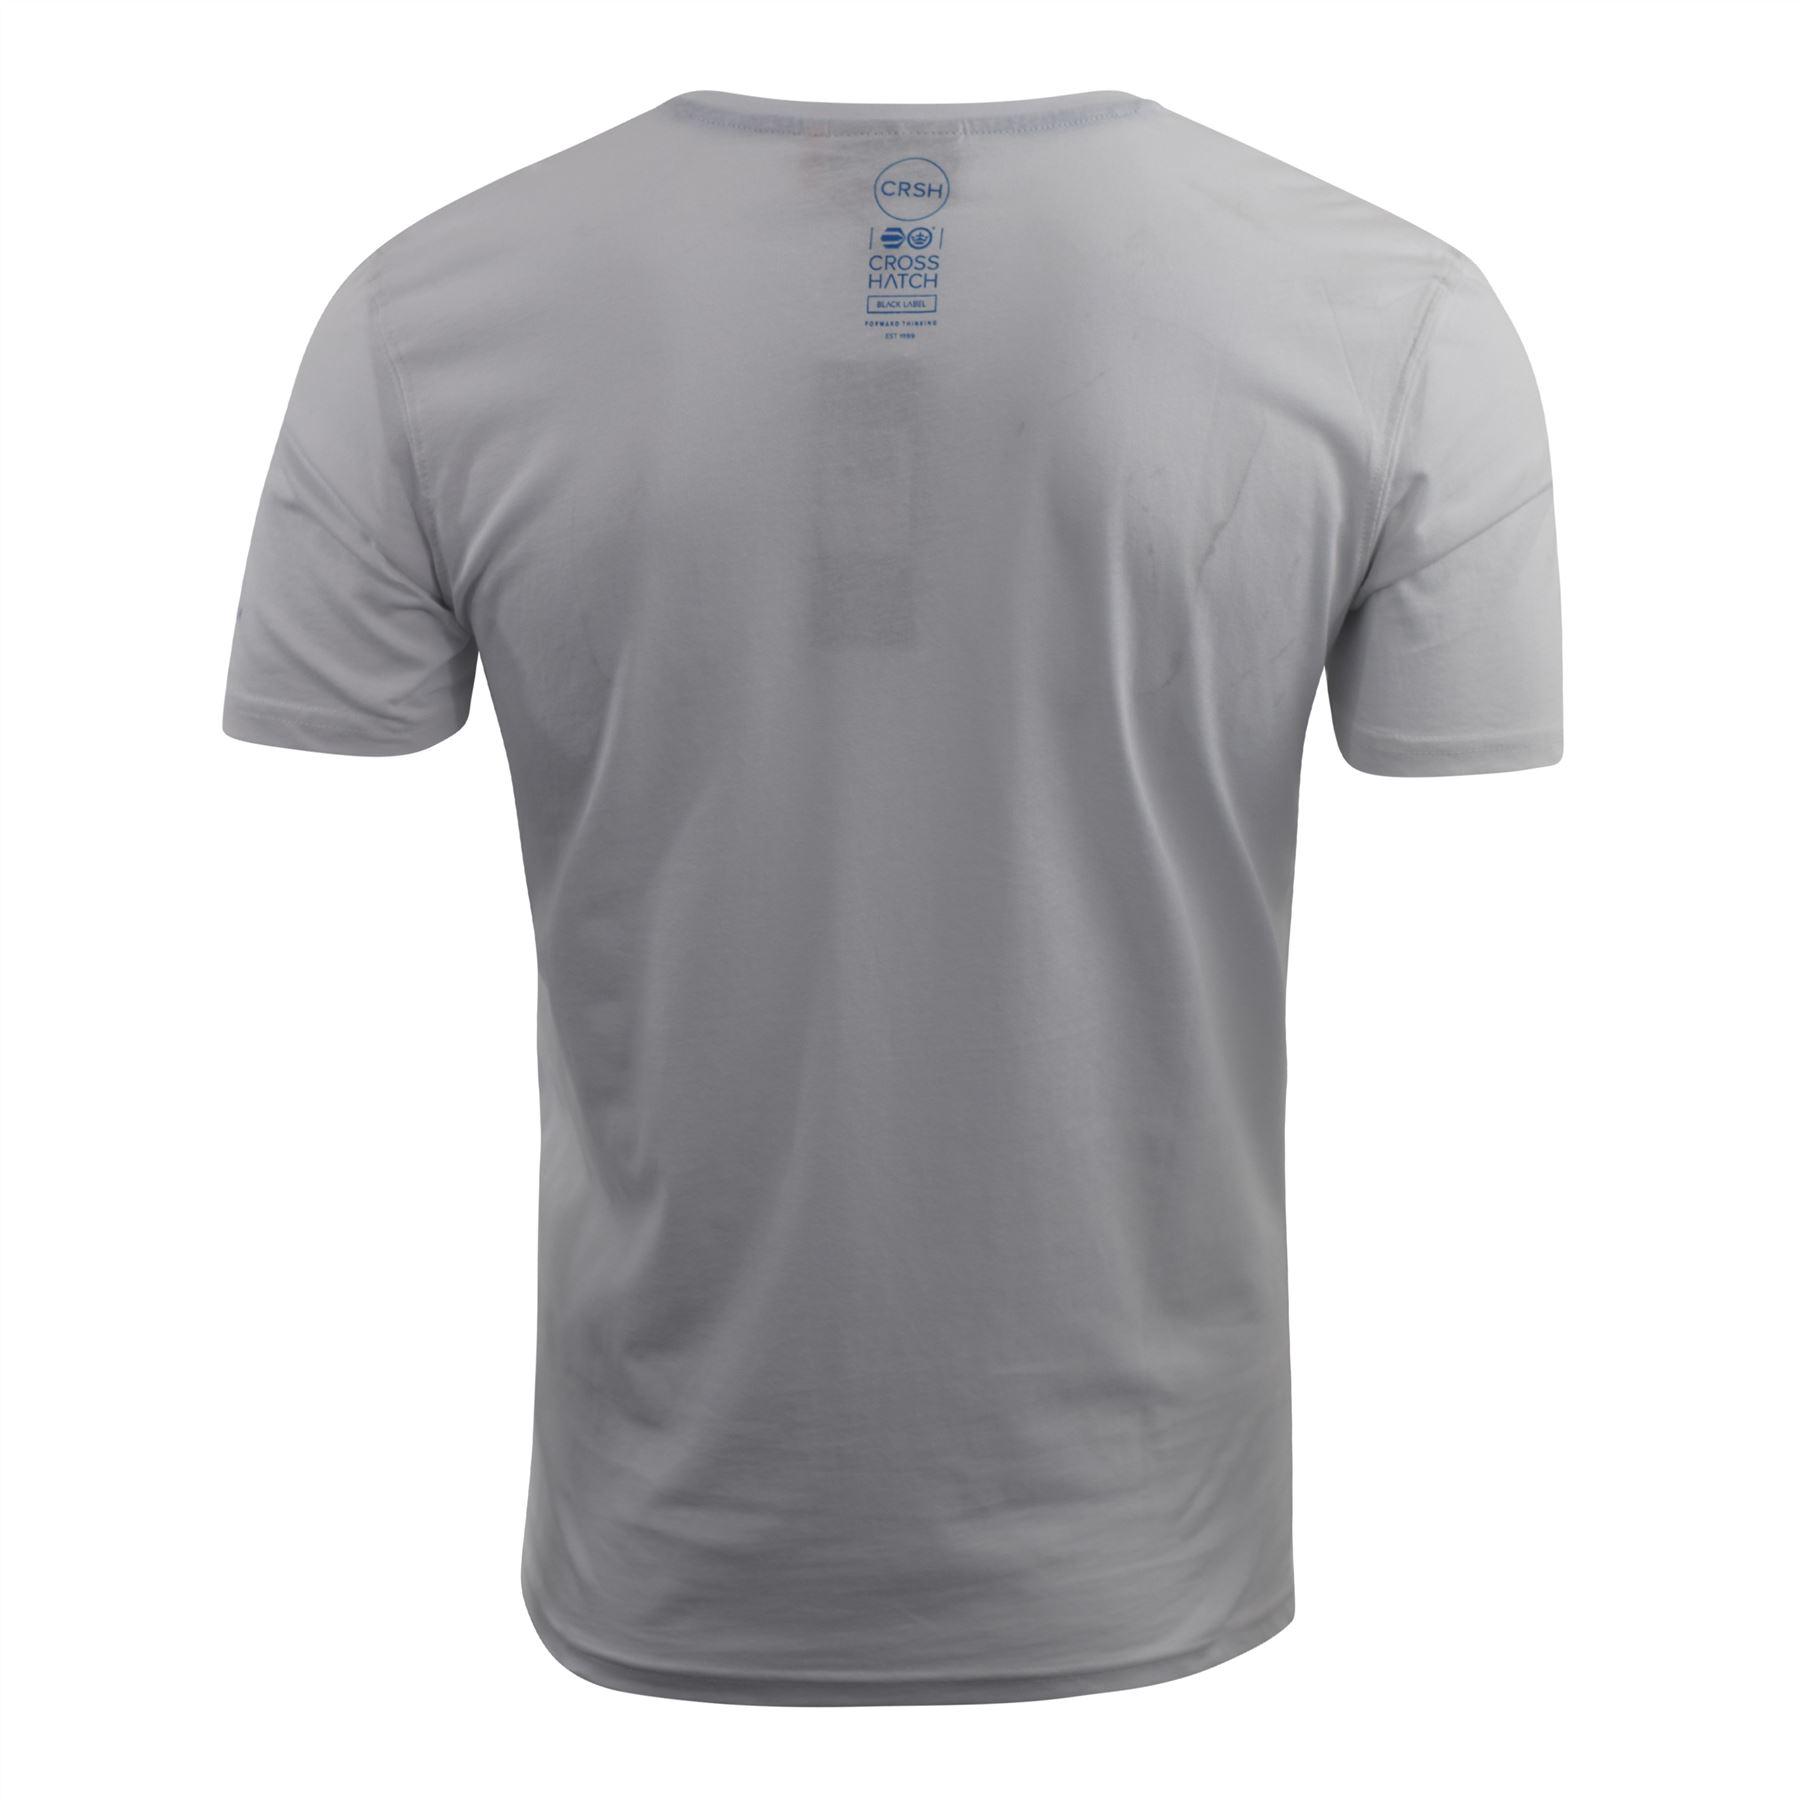 Mens-Crosshatch-T-shirt-Contrast-Graphic-Print-Top-Tee-Westfan thumbnail 10